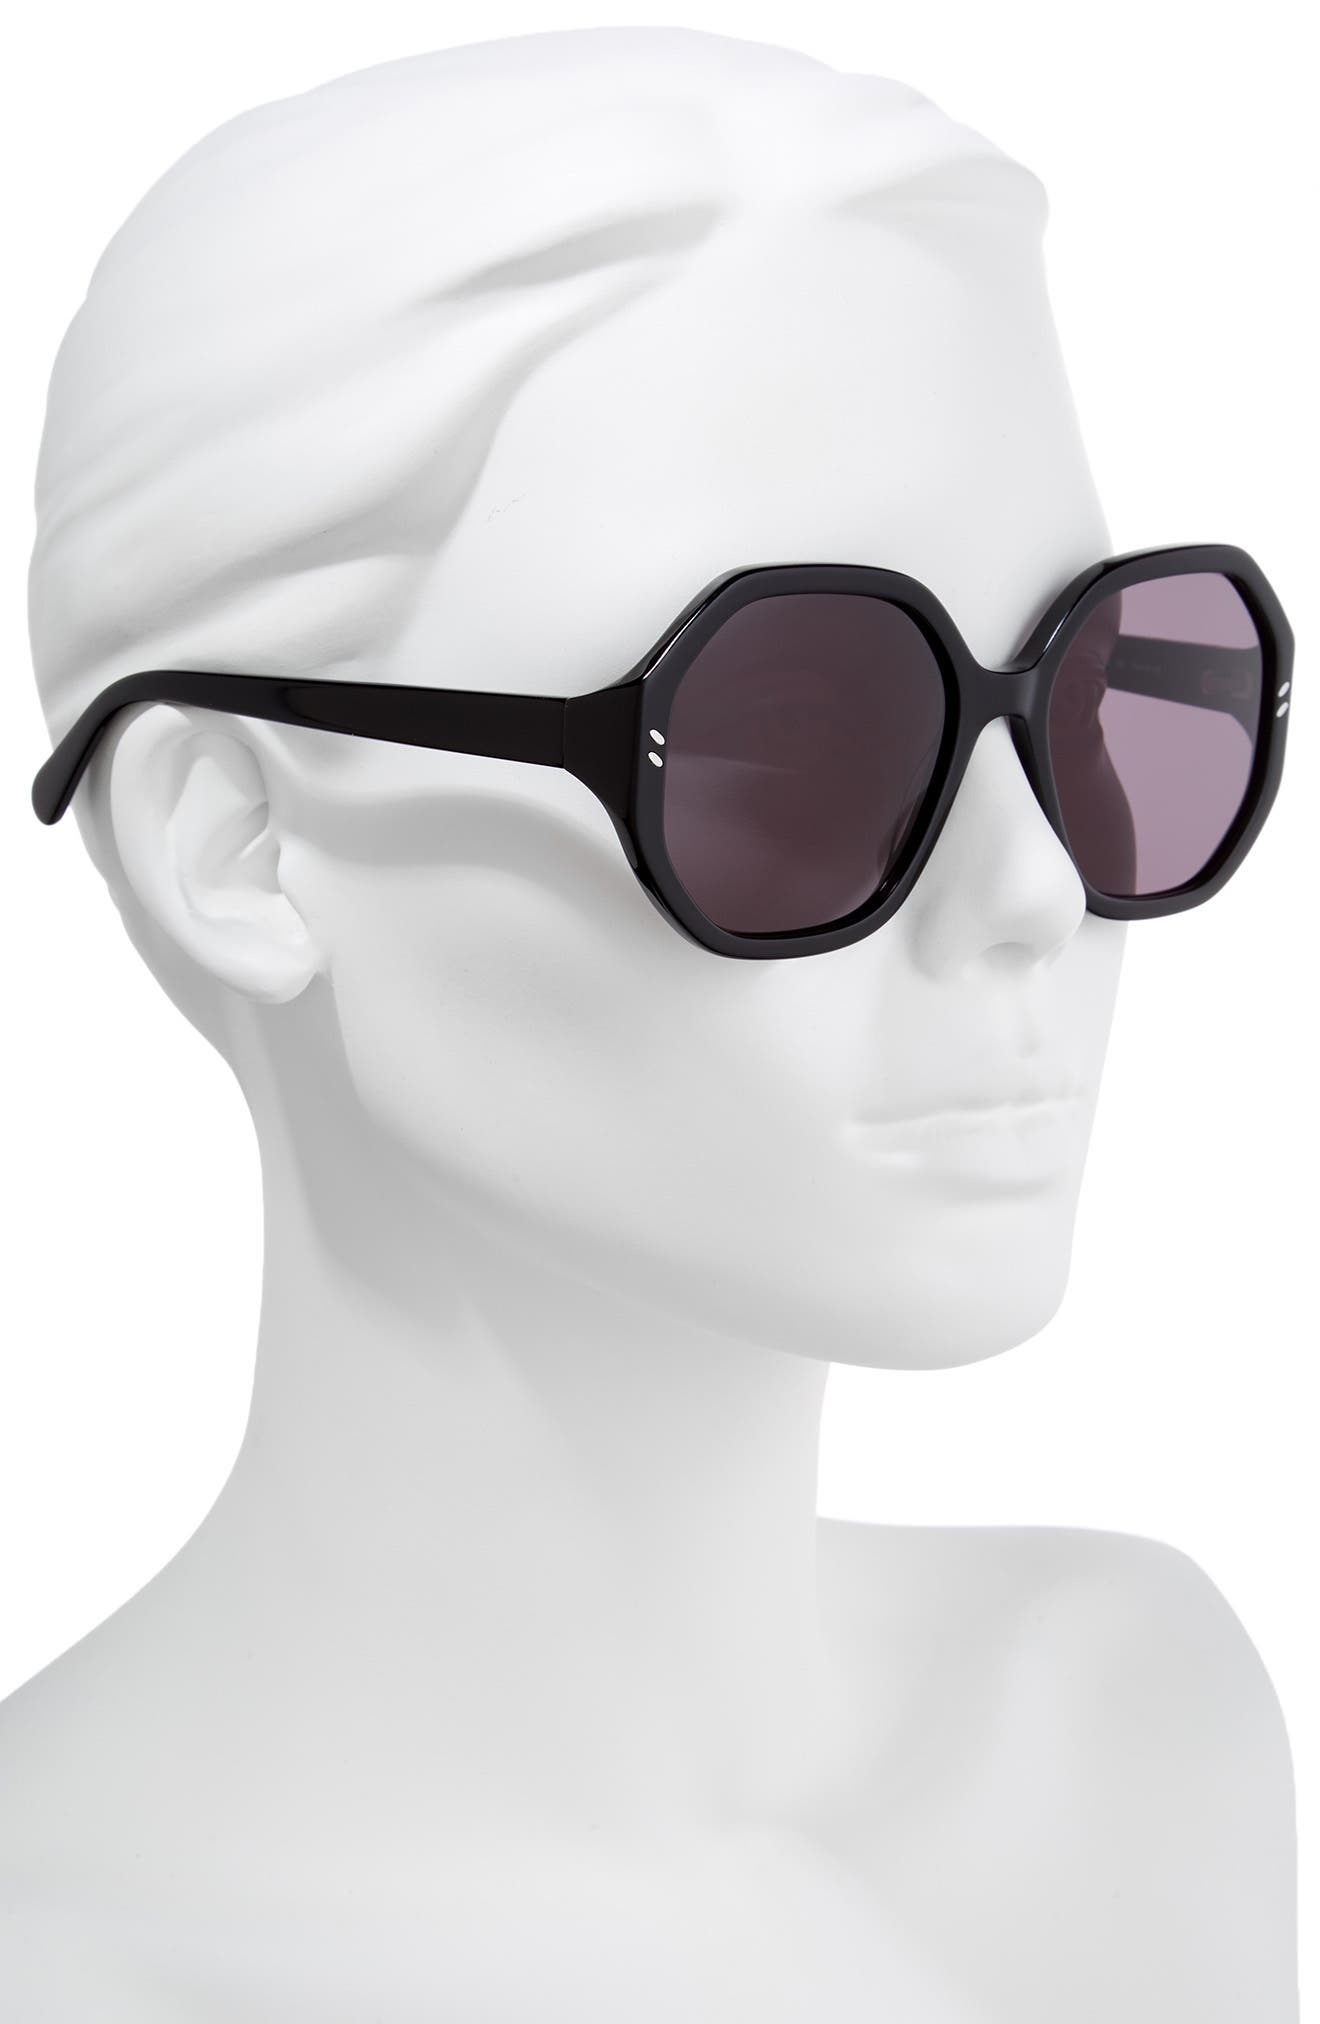 56mm Hexagonal Sunglasses,                             Alternate thumbnail 2, color,                             BLACK